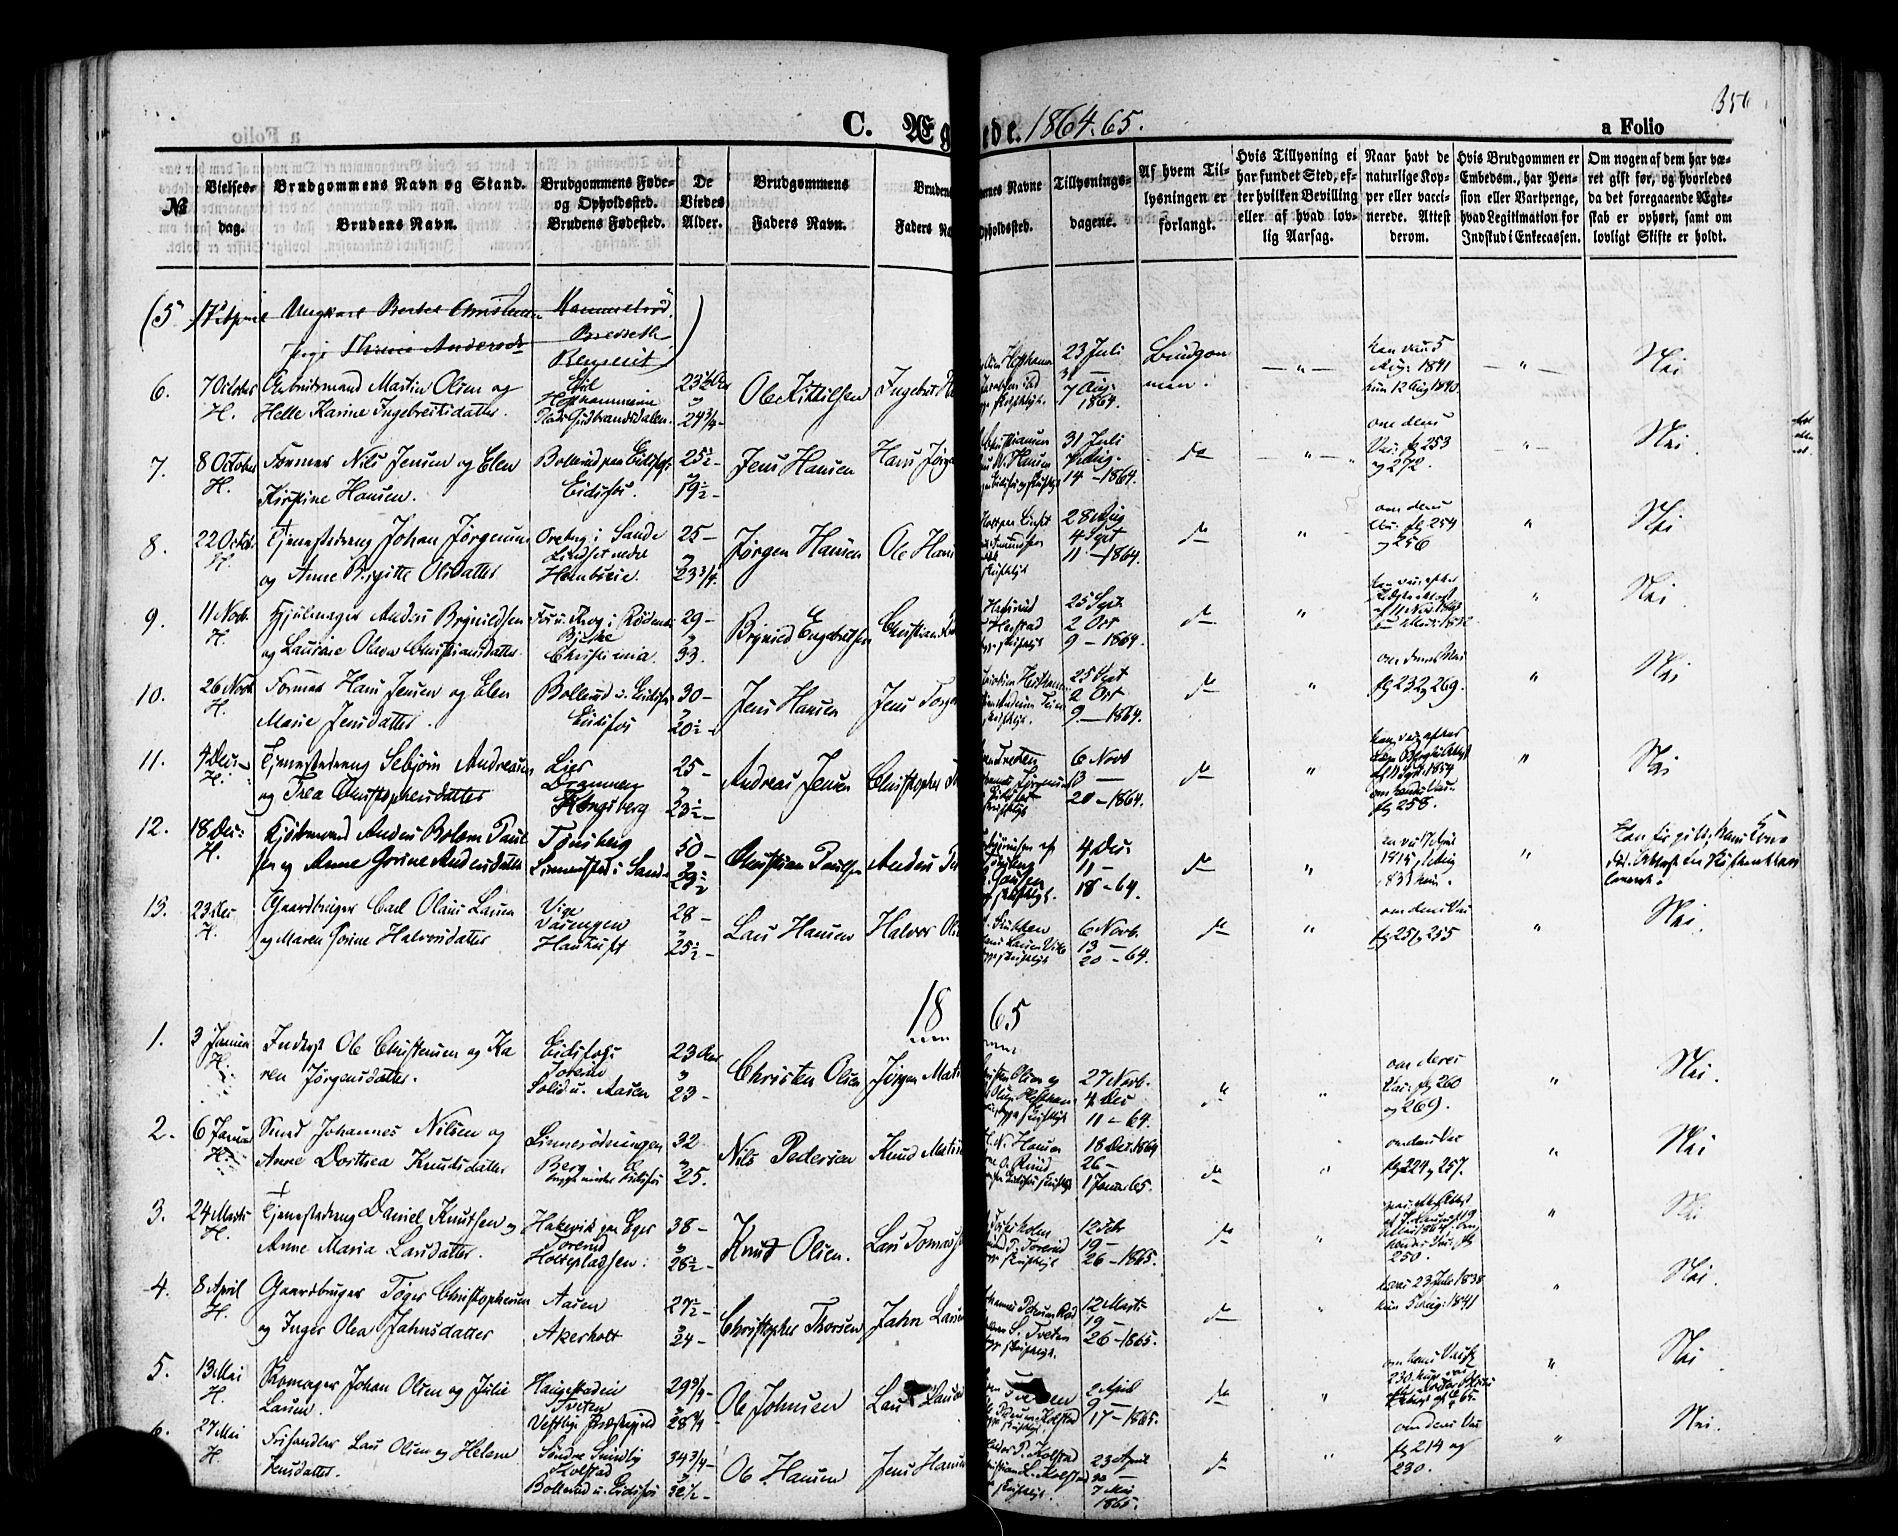 SAKO, Hof kirkebøker, F/Fa/L0006: Parish register (official) no. I 6, 1851-1877, p. 356